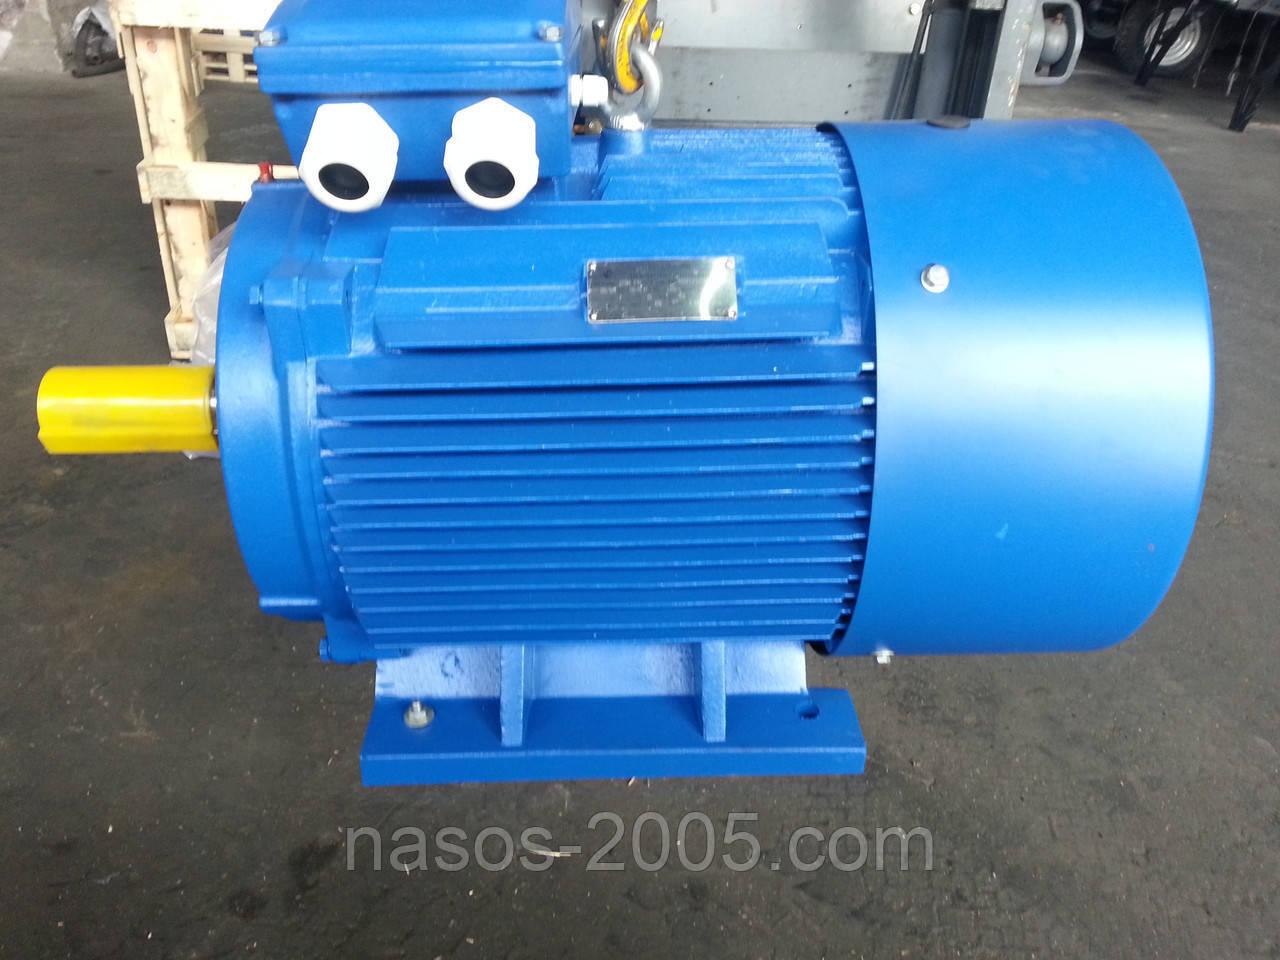 Електродвигун АІР 100 L2 5,5 кВт 3000 об/хв